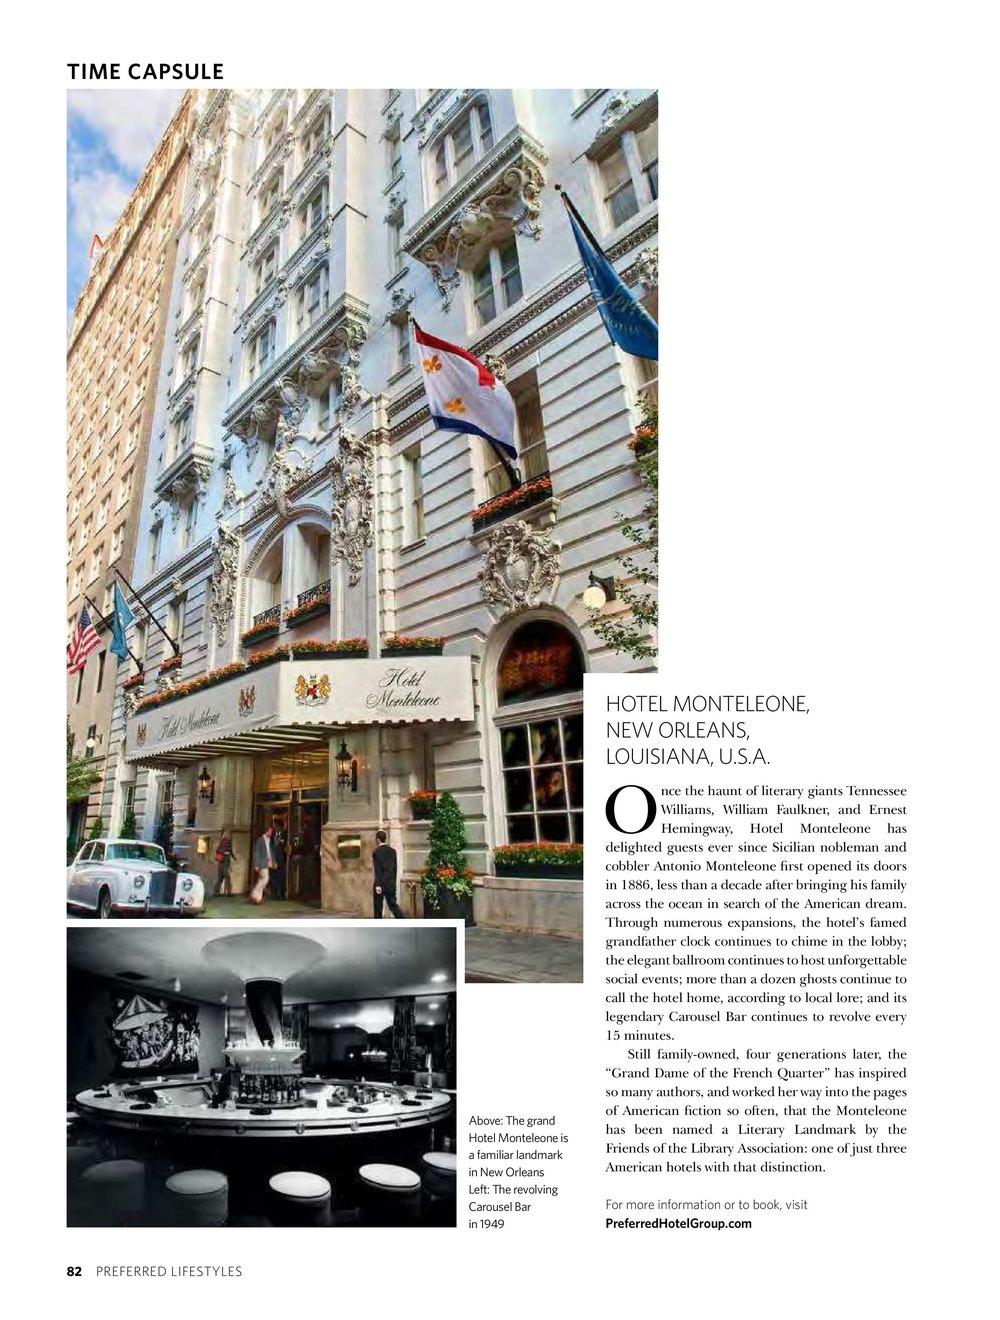 """Time Capsule: Hotel Monteleone,"" Preferred Lifestyles (Vol. 10, 2014)"